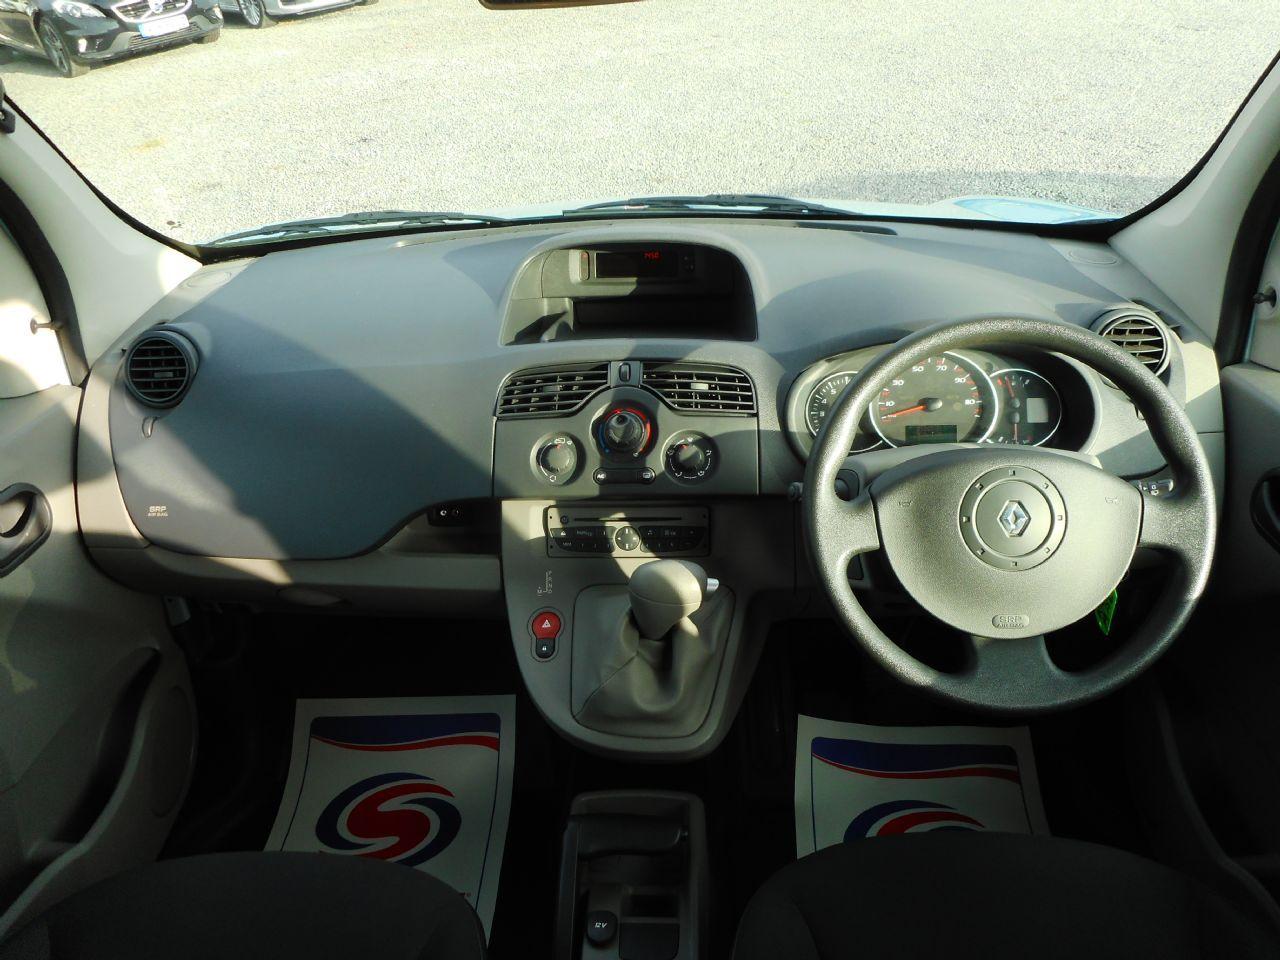 RENAULT KANGOO Extreme 1.6 16v Auto (2011) - Picture 3